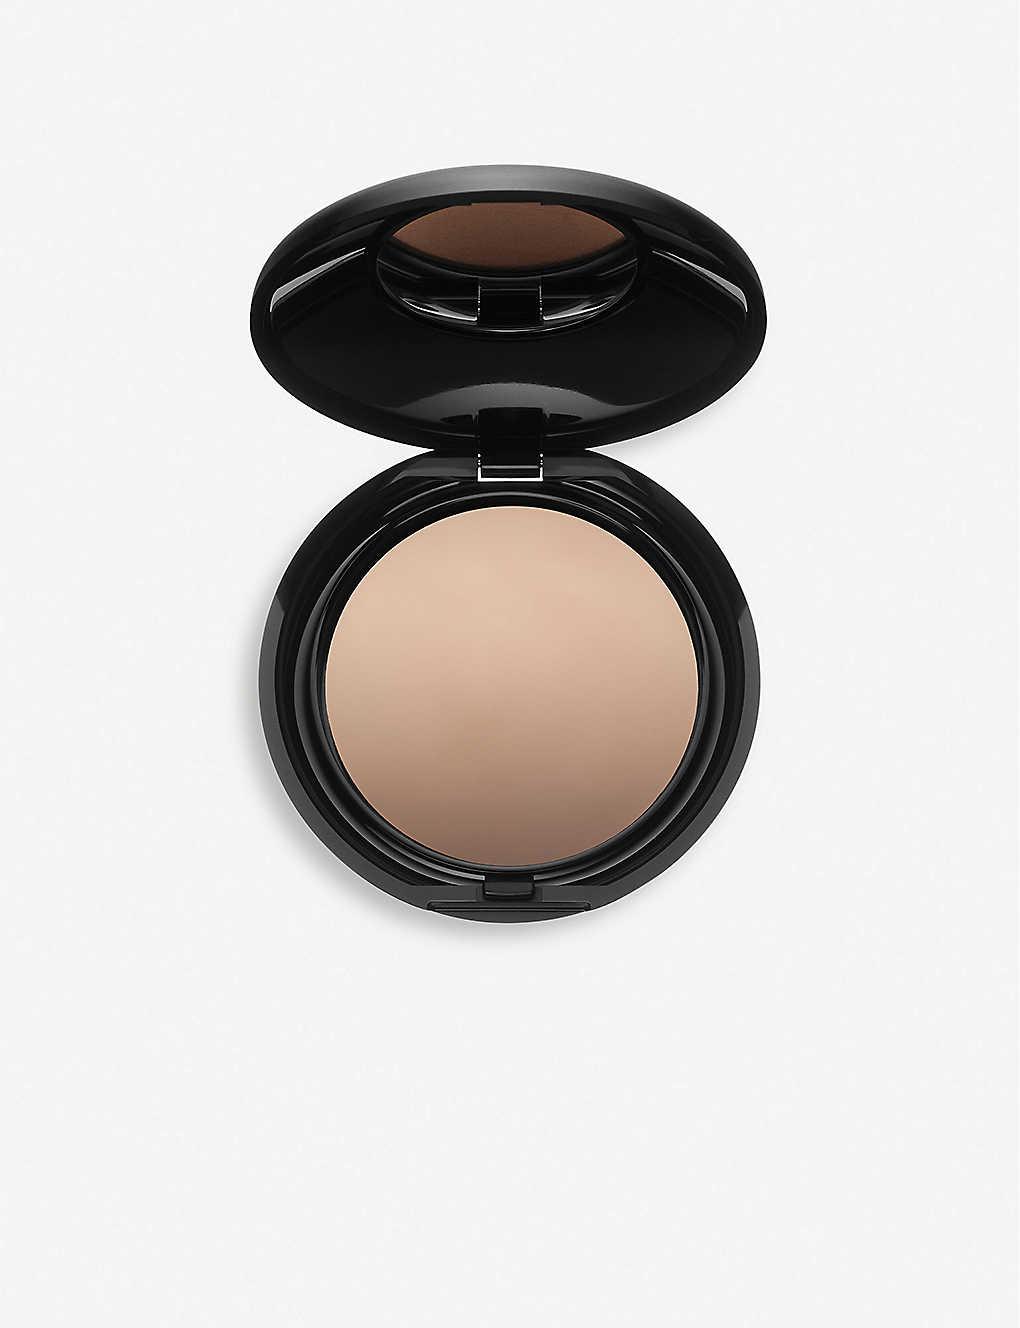 PAT MCGRATH LABS: Skin Fetish Sublime Perfection Blurring Under-Eye Powder 4g